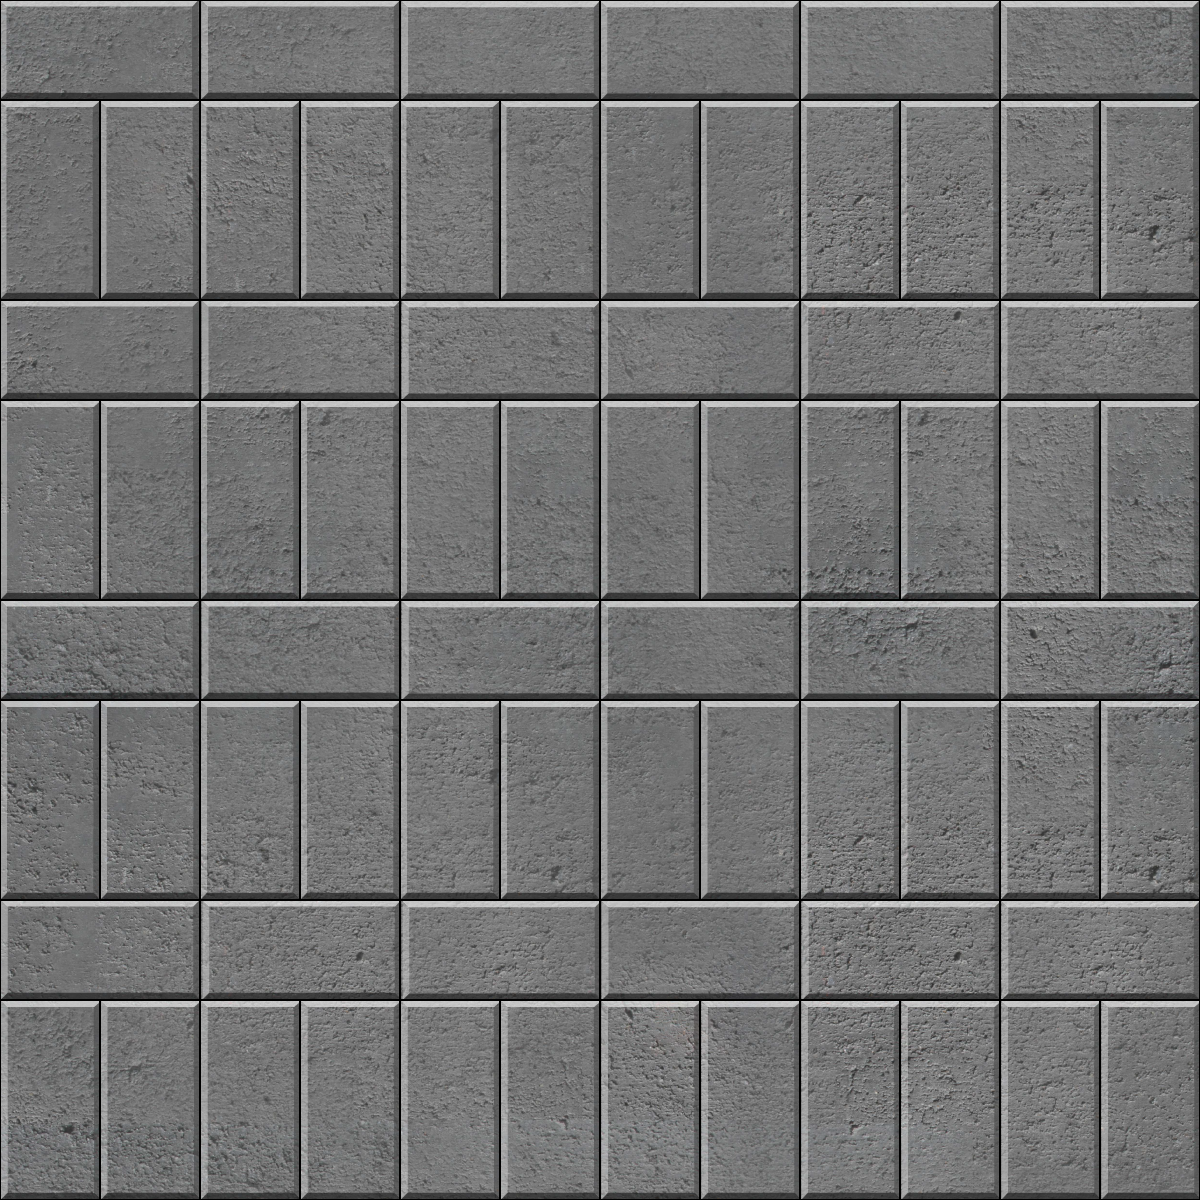 Running Stacked bond brick paver